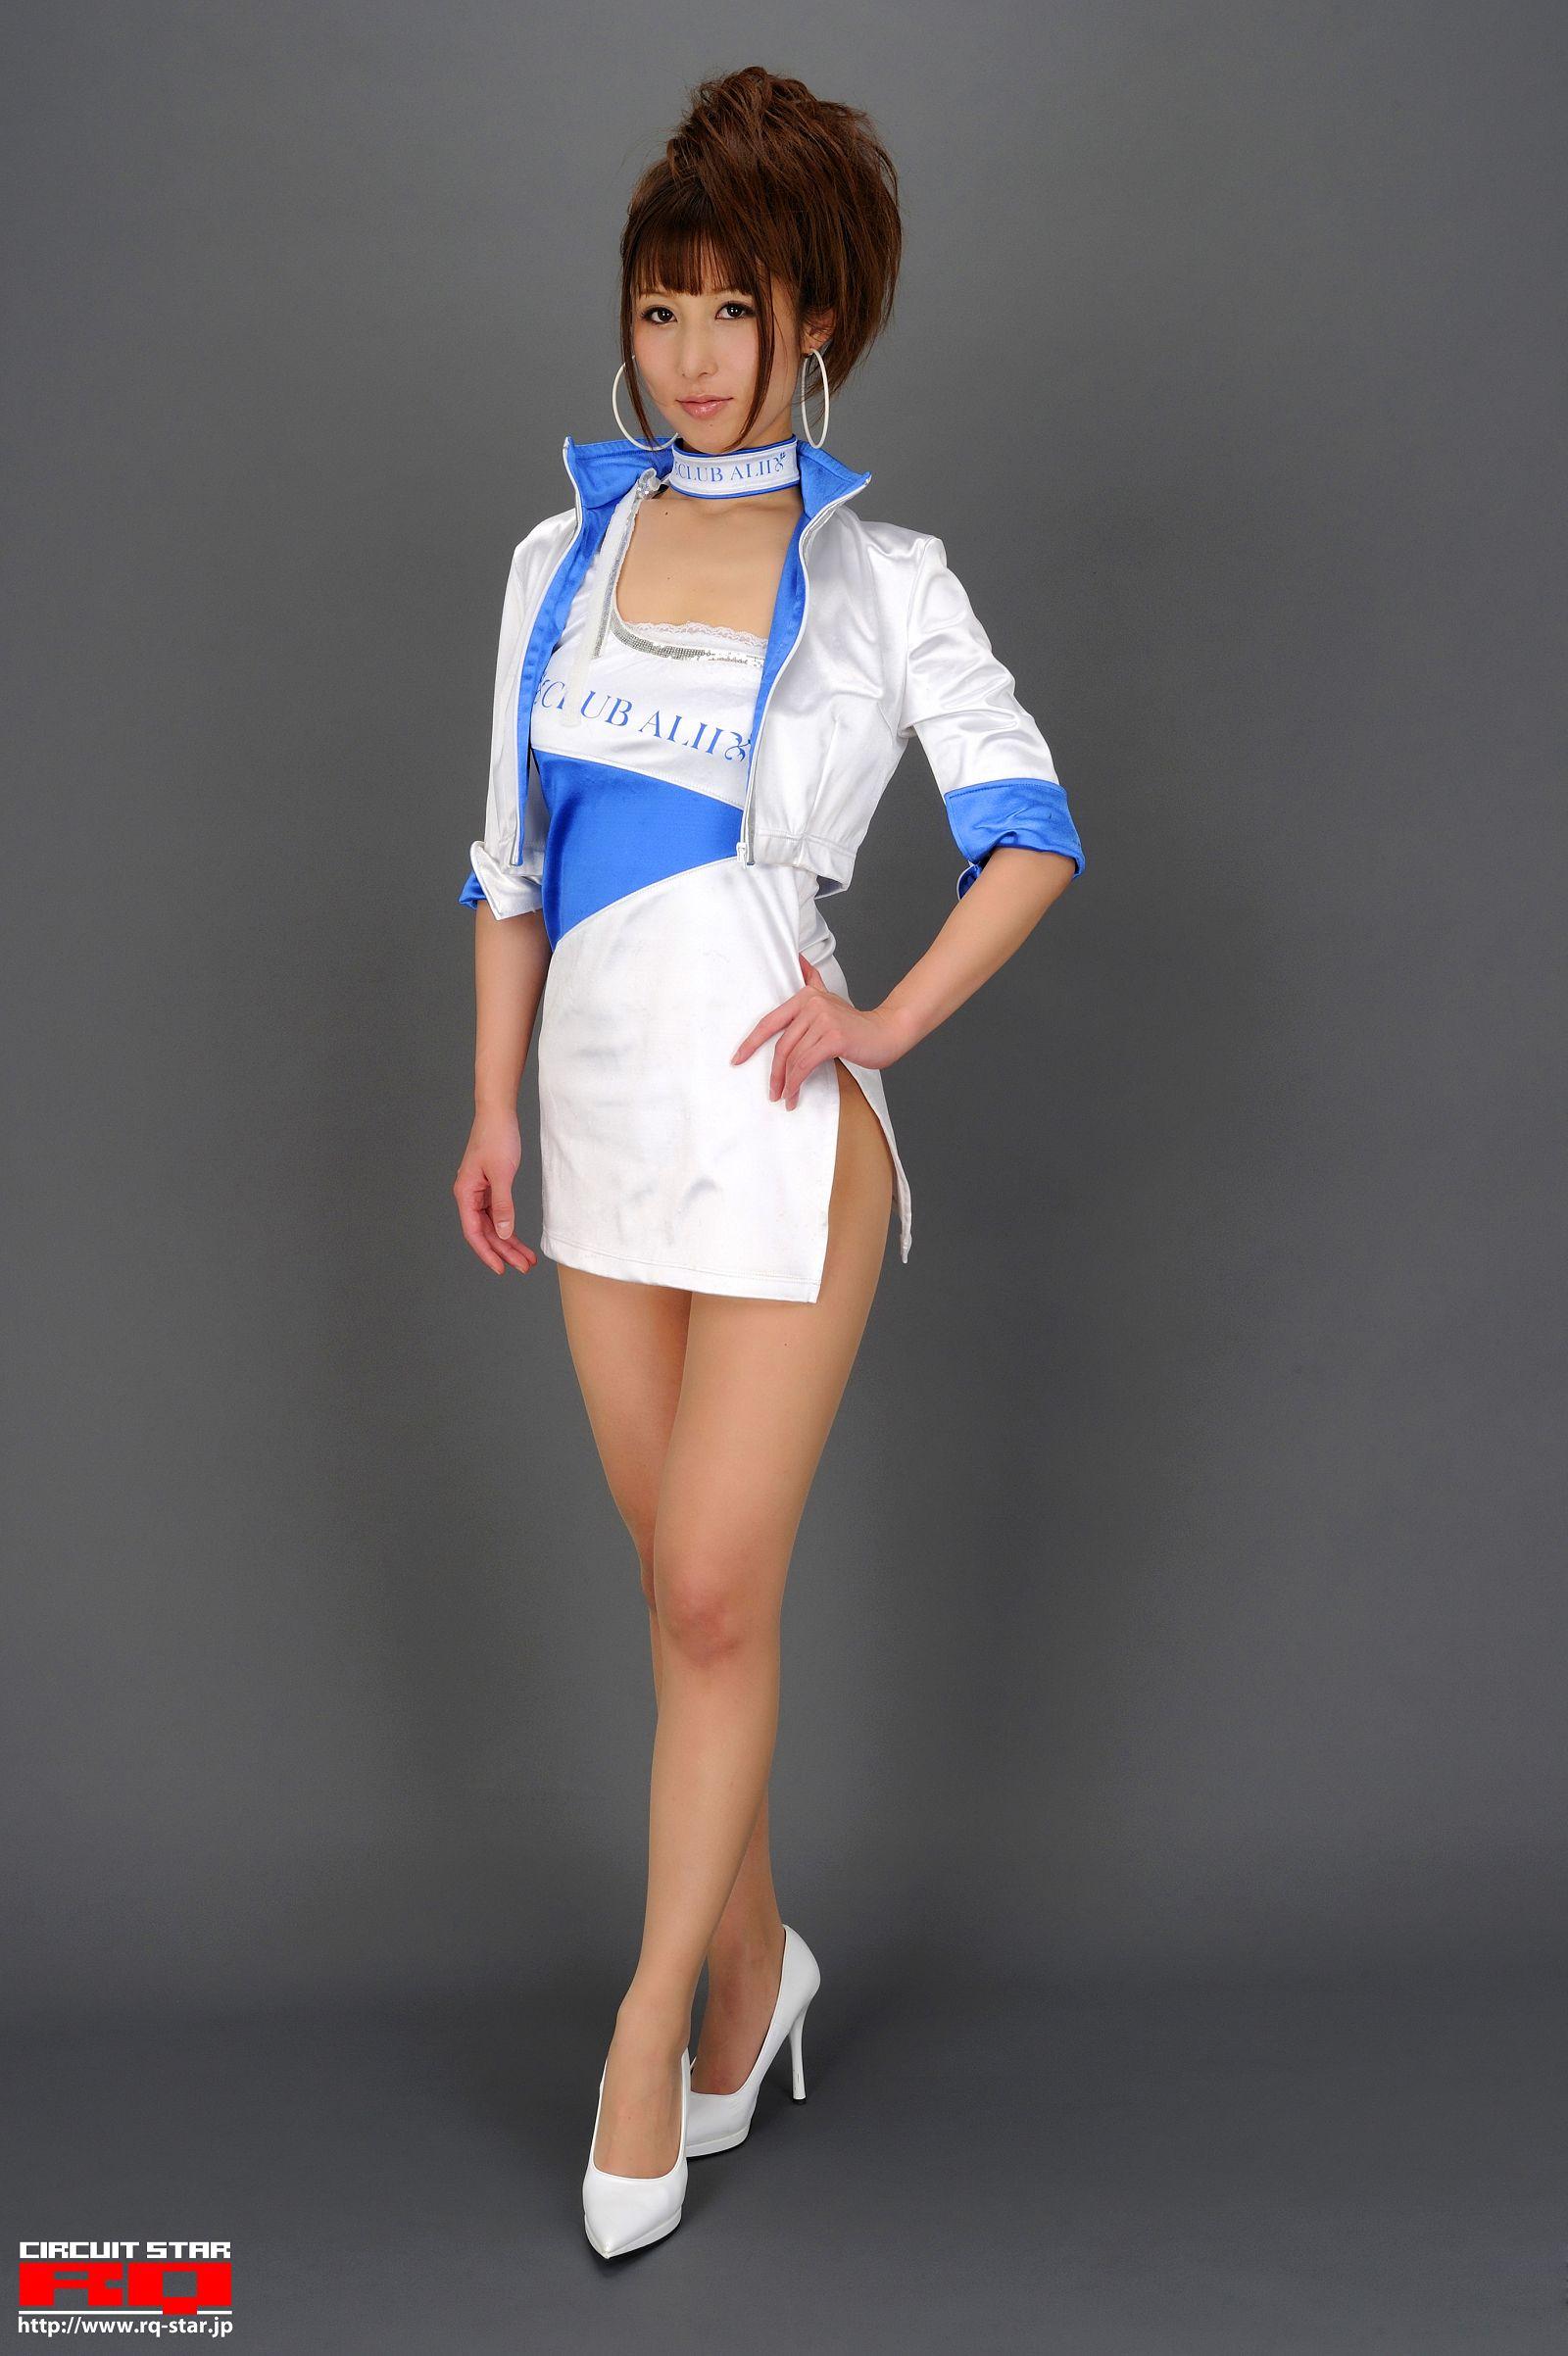 [RQ STAR美女] NO.0267 You Akasaka 赤坂陽 Race Queen[92P] RQ STAR 第1张